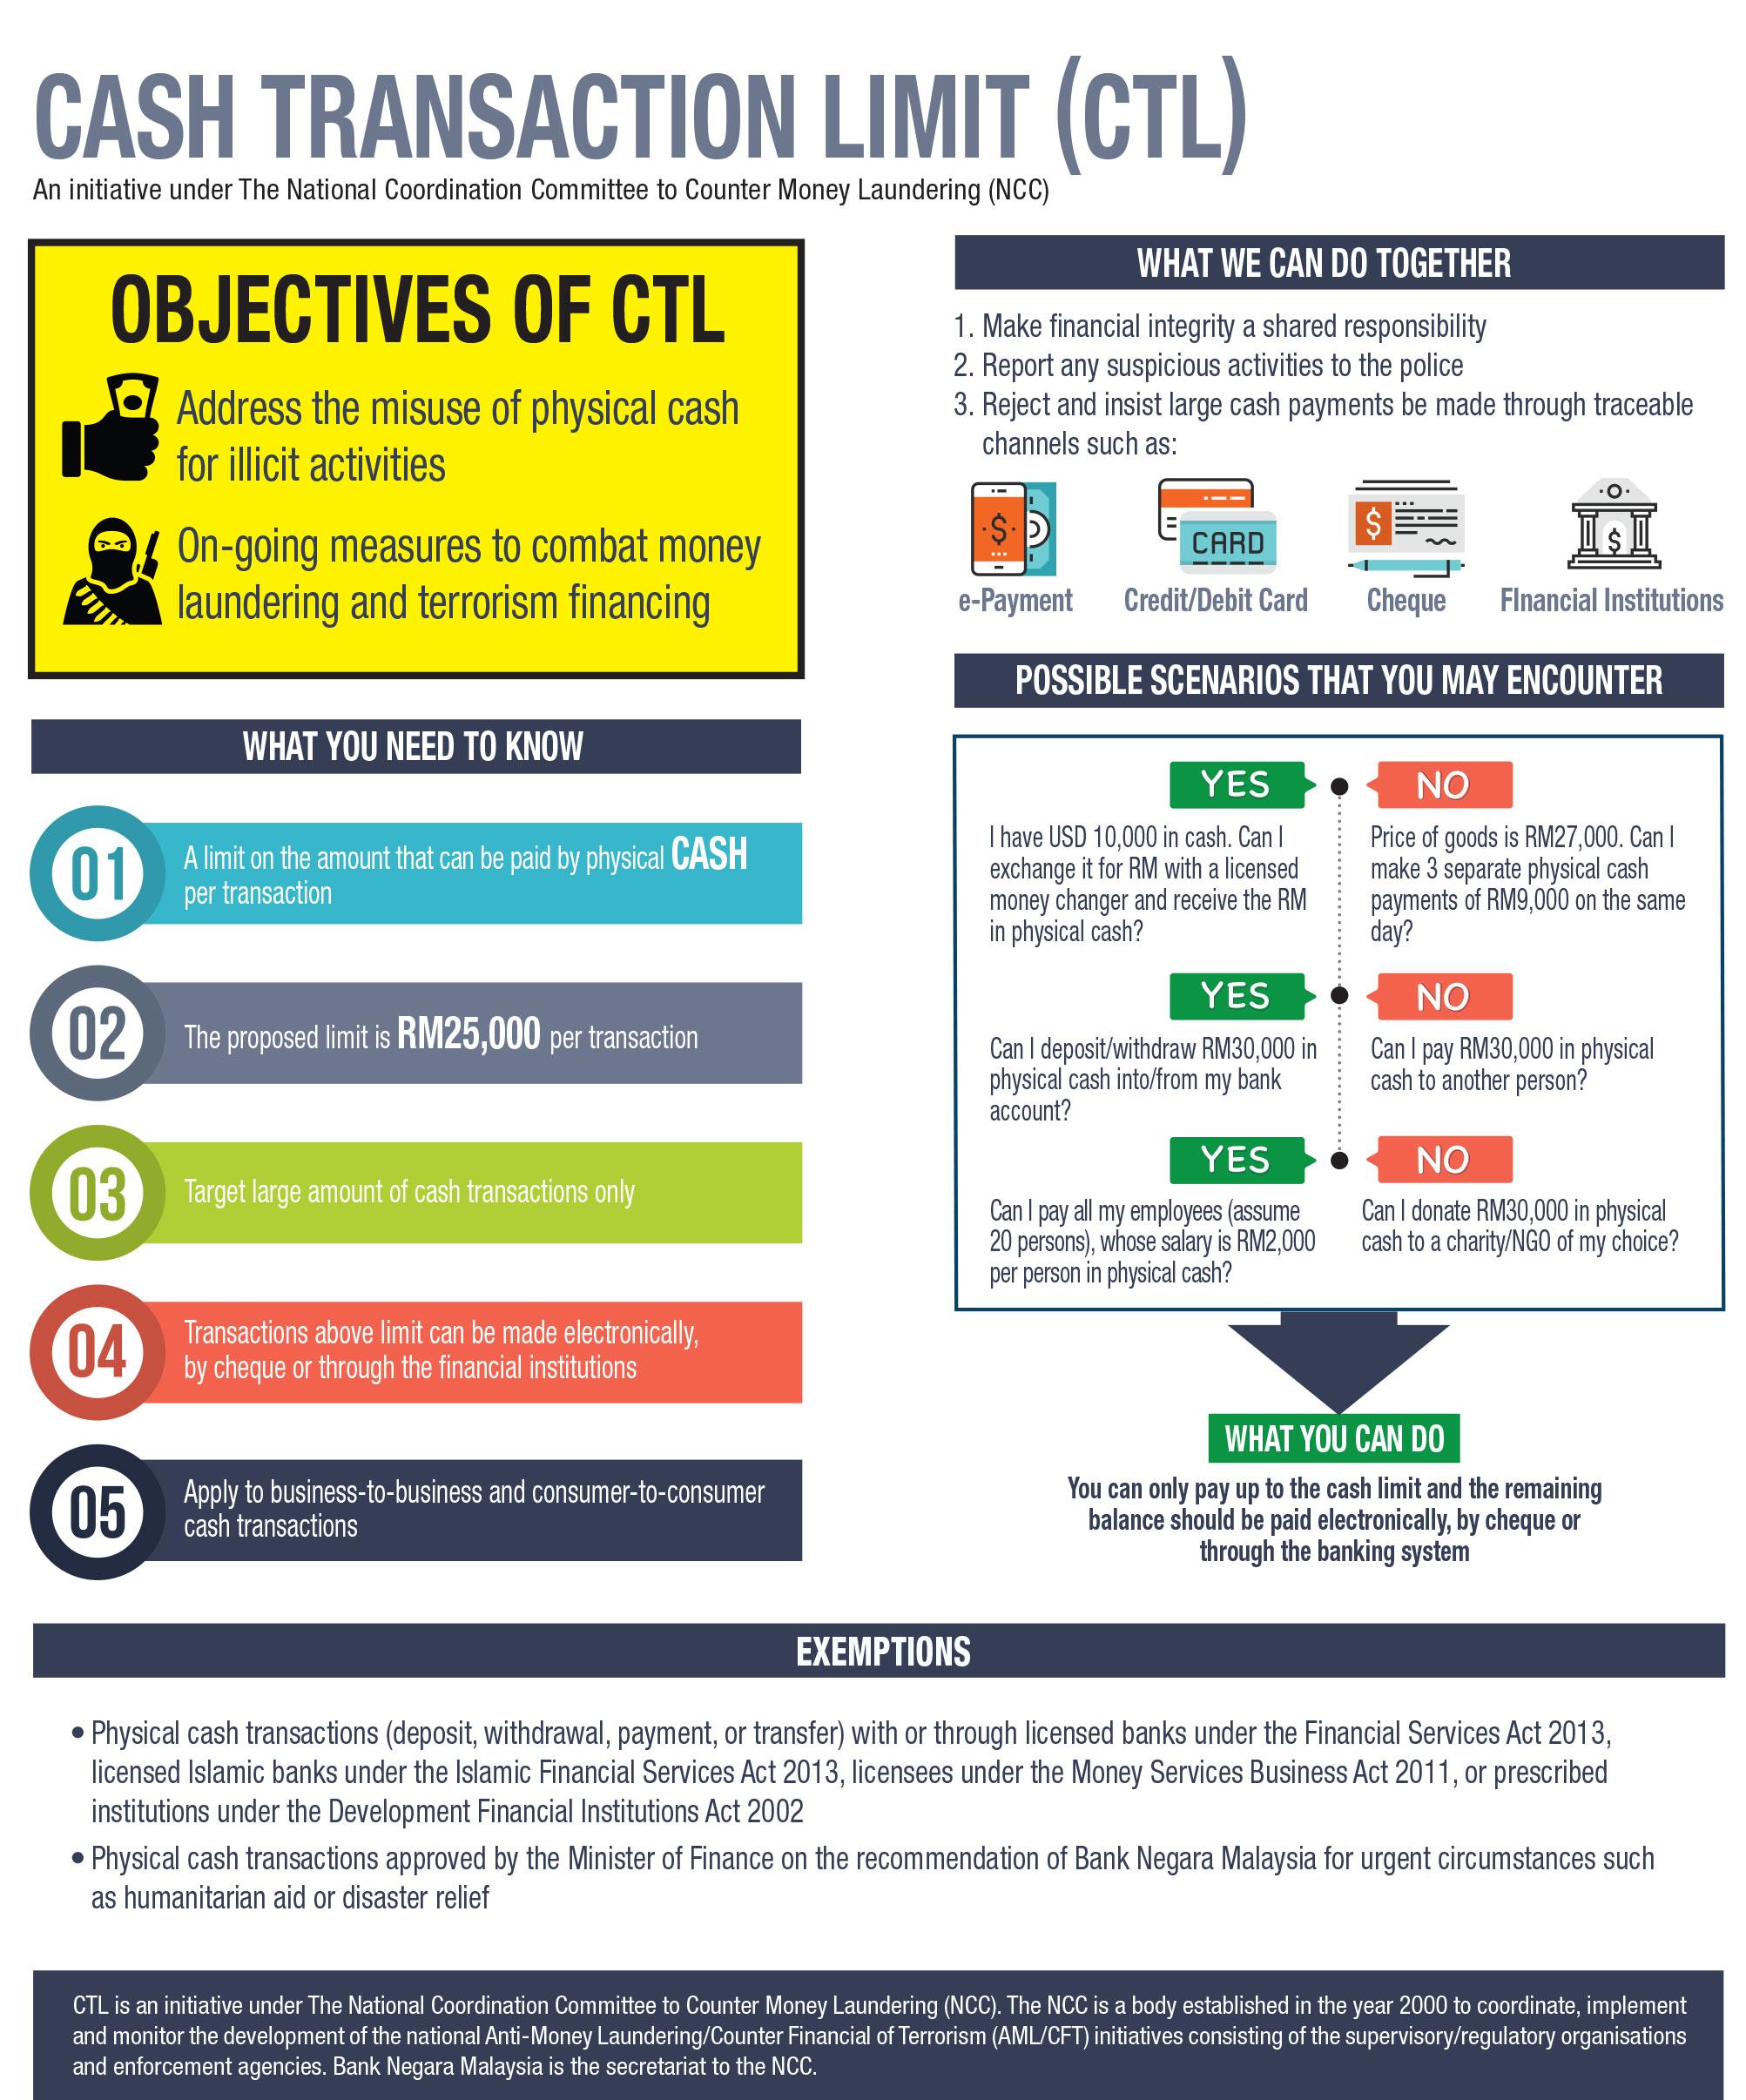 Bank Negara Malaysia Explains: What is Cash Transaction Limit (CTL) (November 2019)